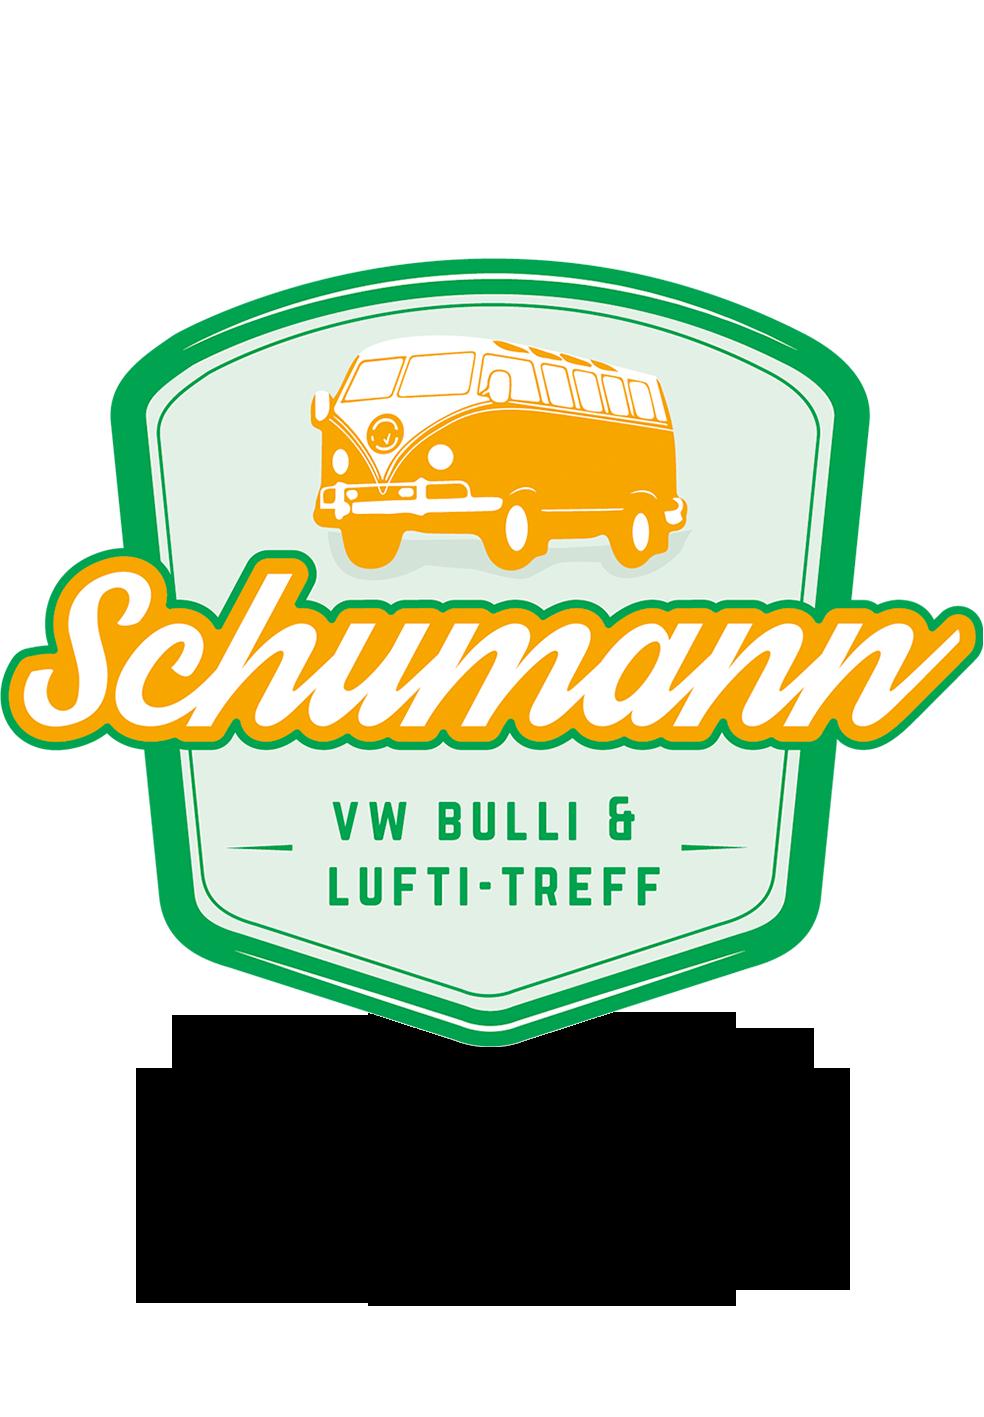 Schumann VW Bulli & Lufti Treff